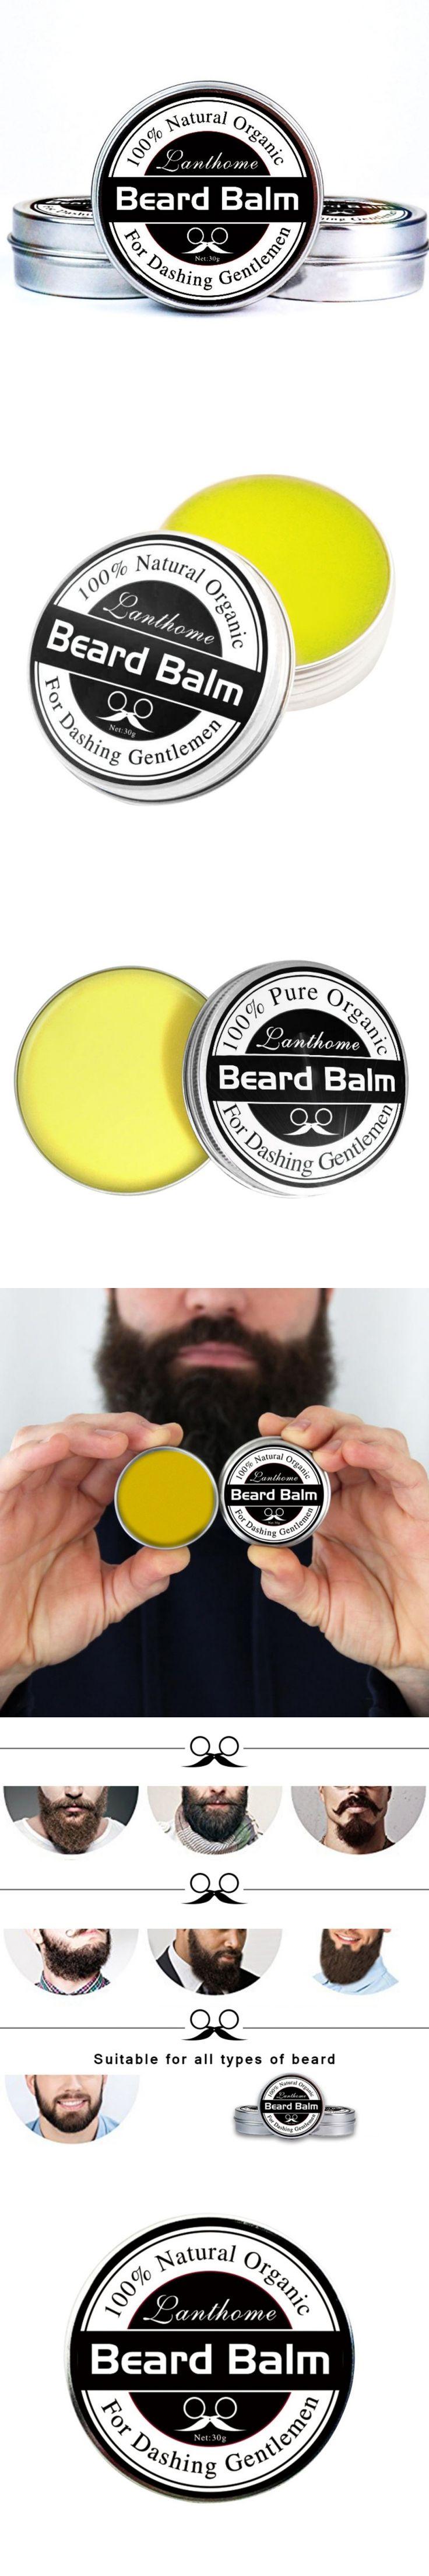 Beard Conditioner Leave Moisturizing Effect Beard Care New Lanthome Natural Men Beard Hair Wax Balm MISS ROSE 25g